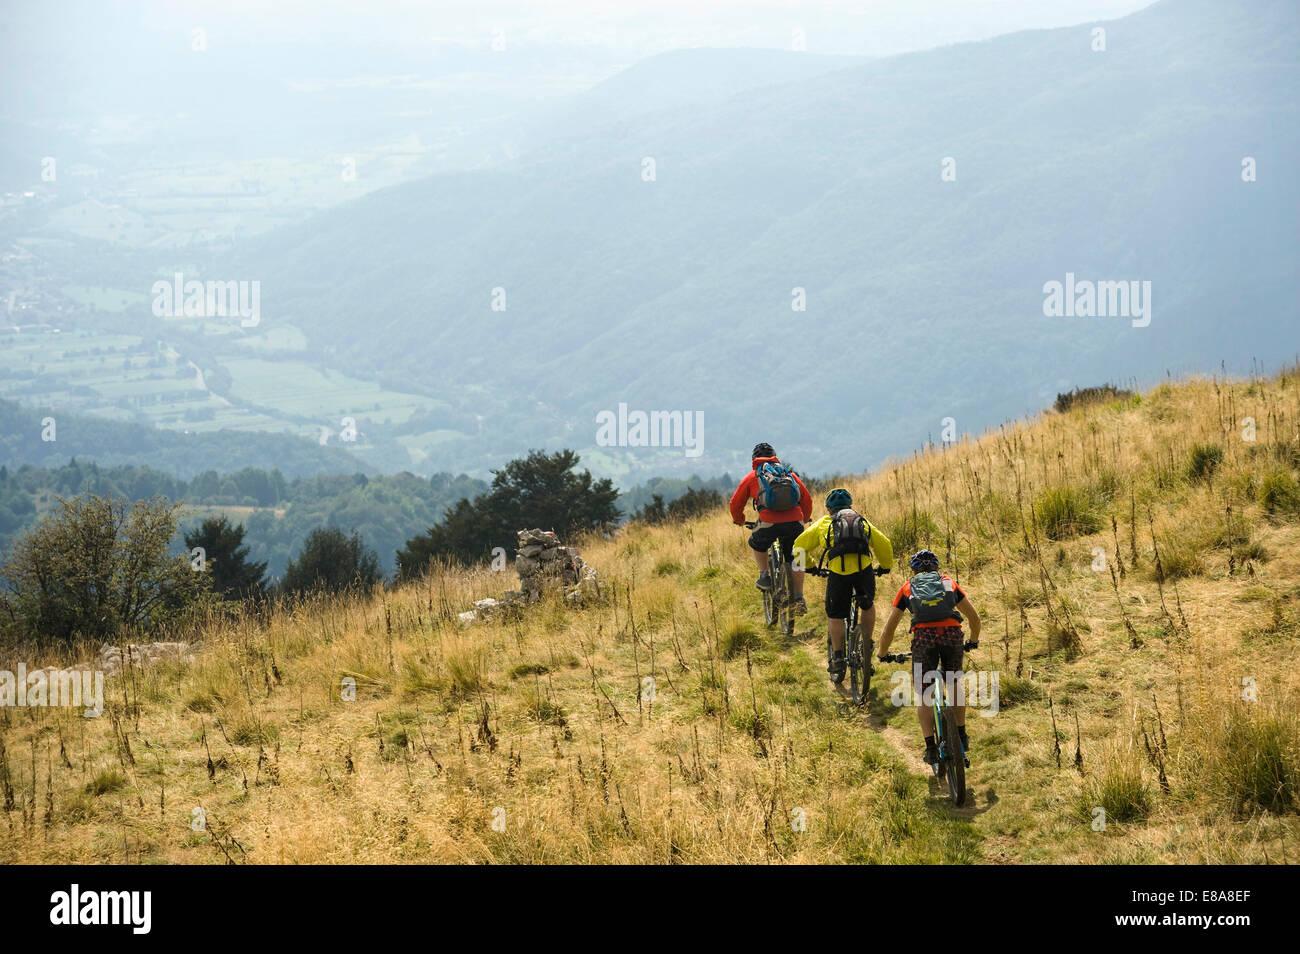 three mountain bikers on the way downhill, Matajur, Istria, Slovenia - Stock Image